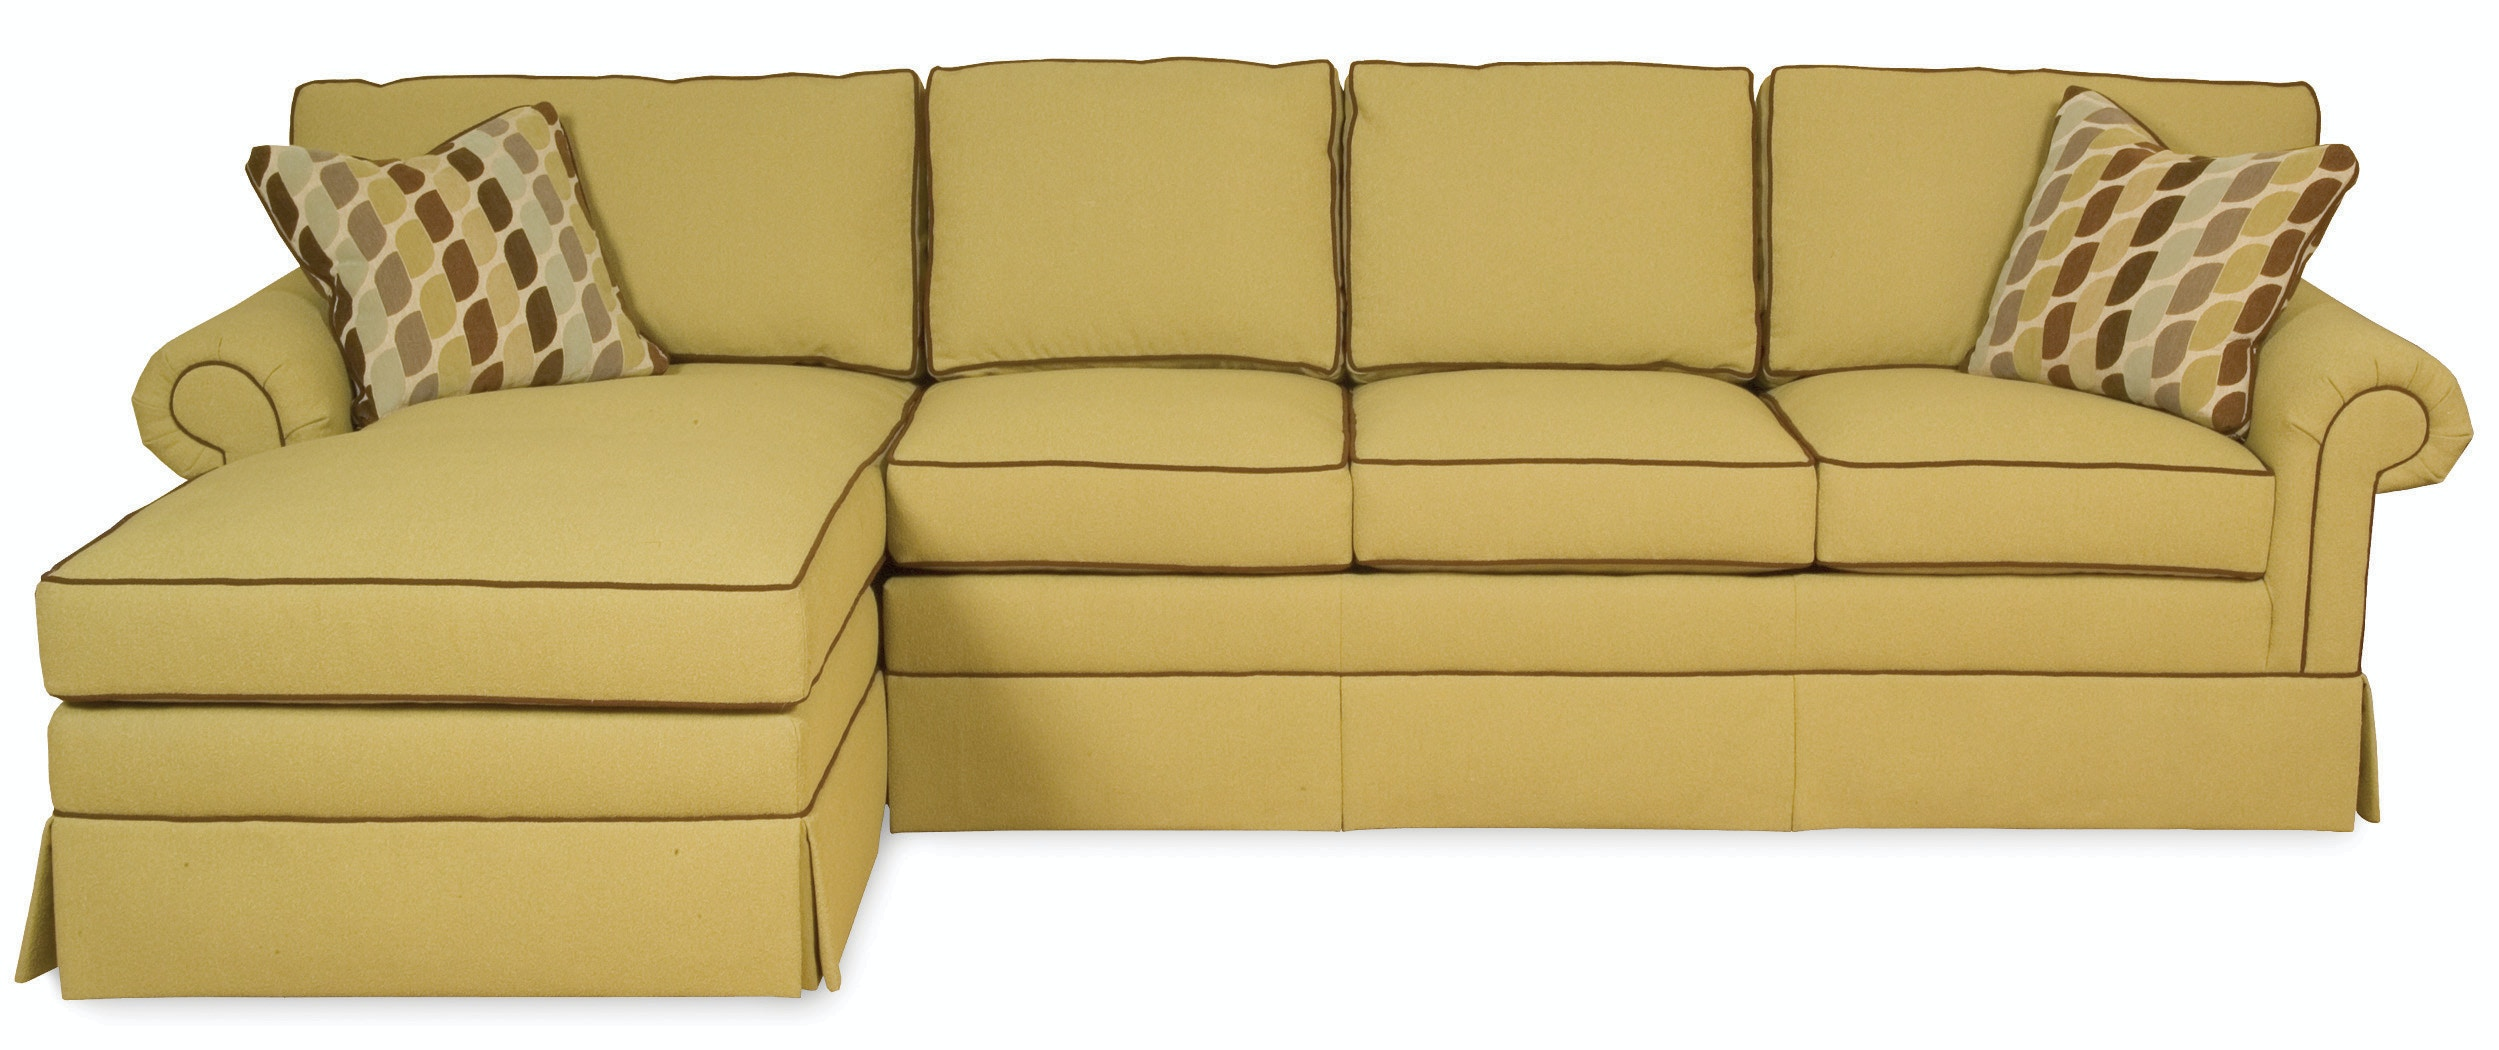 sofas etc towson md costco sofa chair vanguard prices